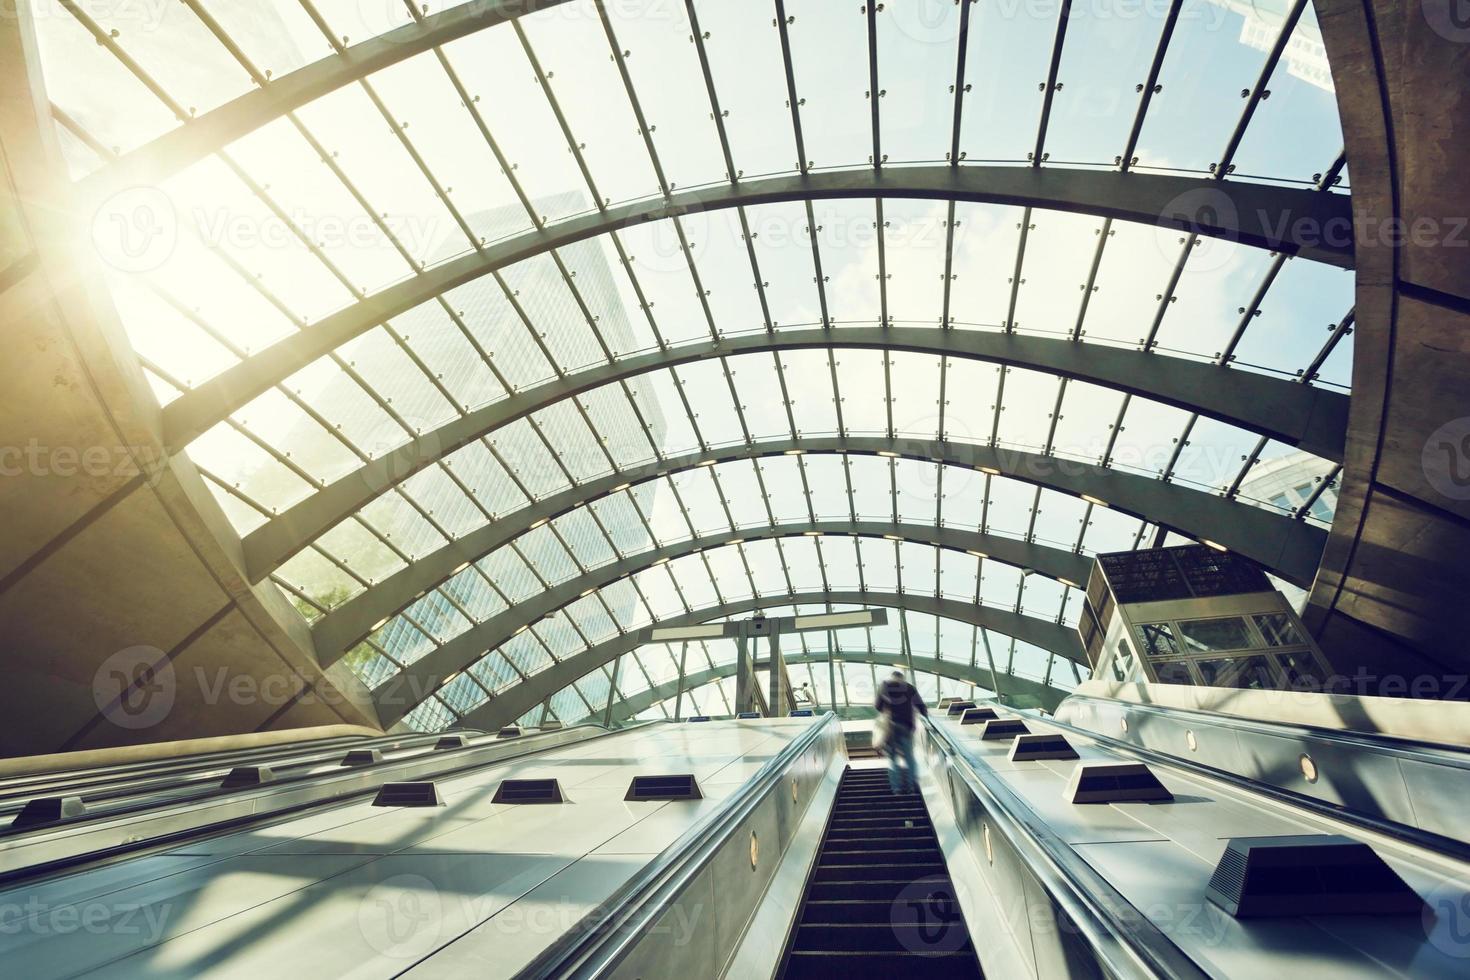 metrostation Canary Wharf, Londen, Engeland, Verenigd Koninkrijk foto